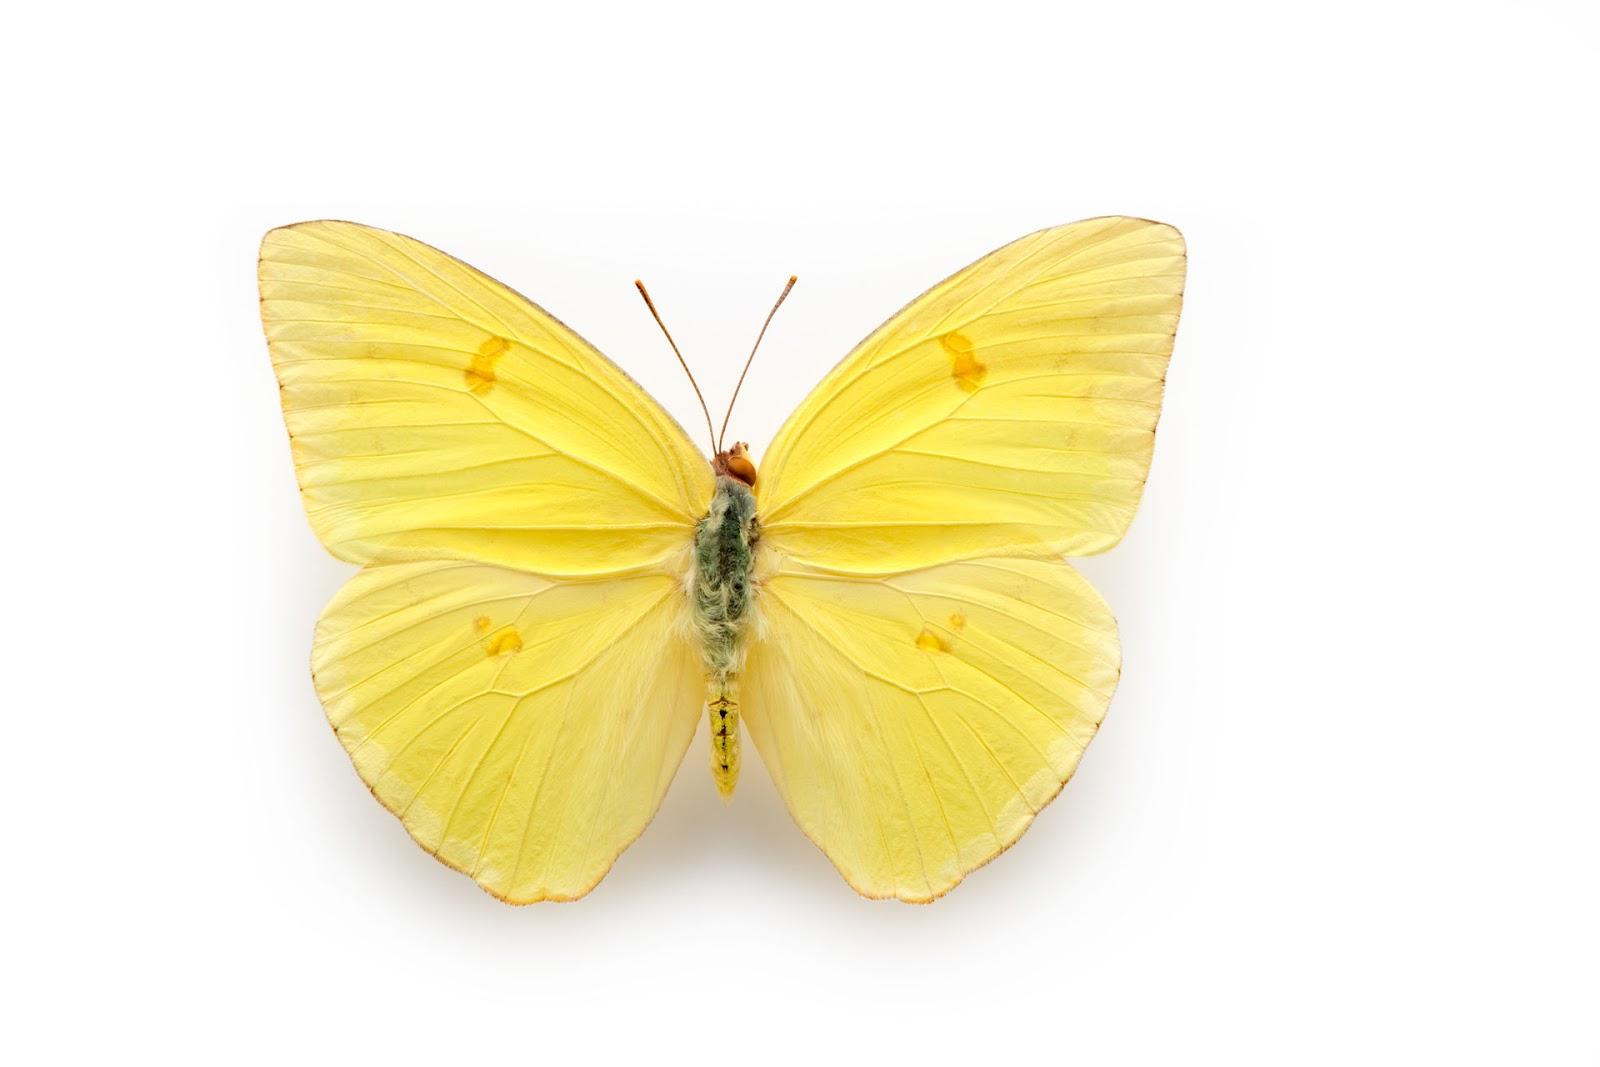 Clouded Sulphur |Clouded Sulphur Butterfly